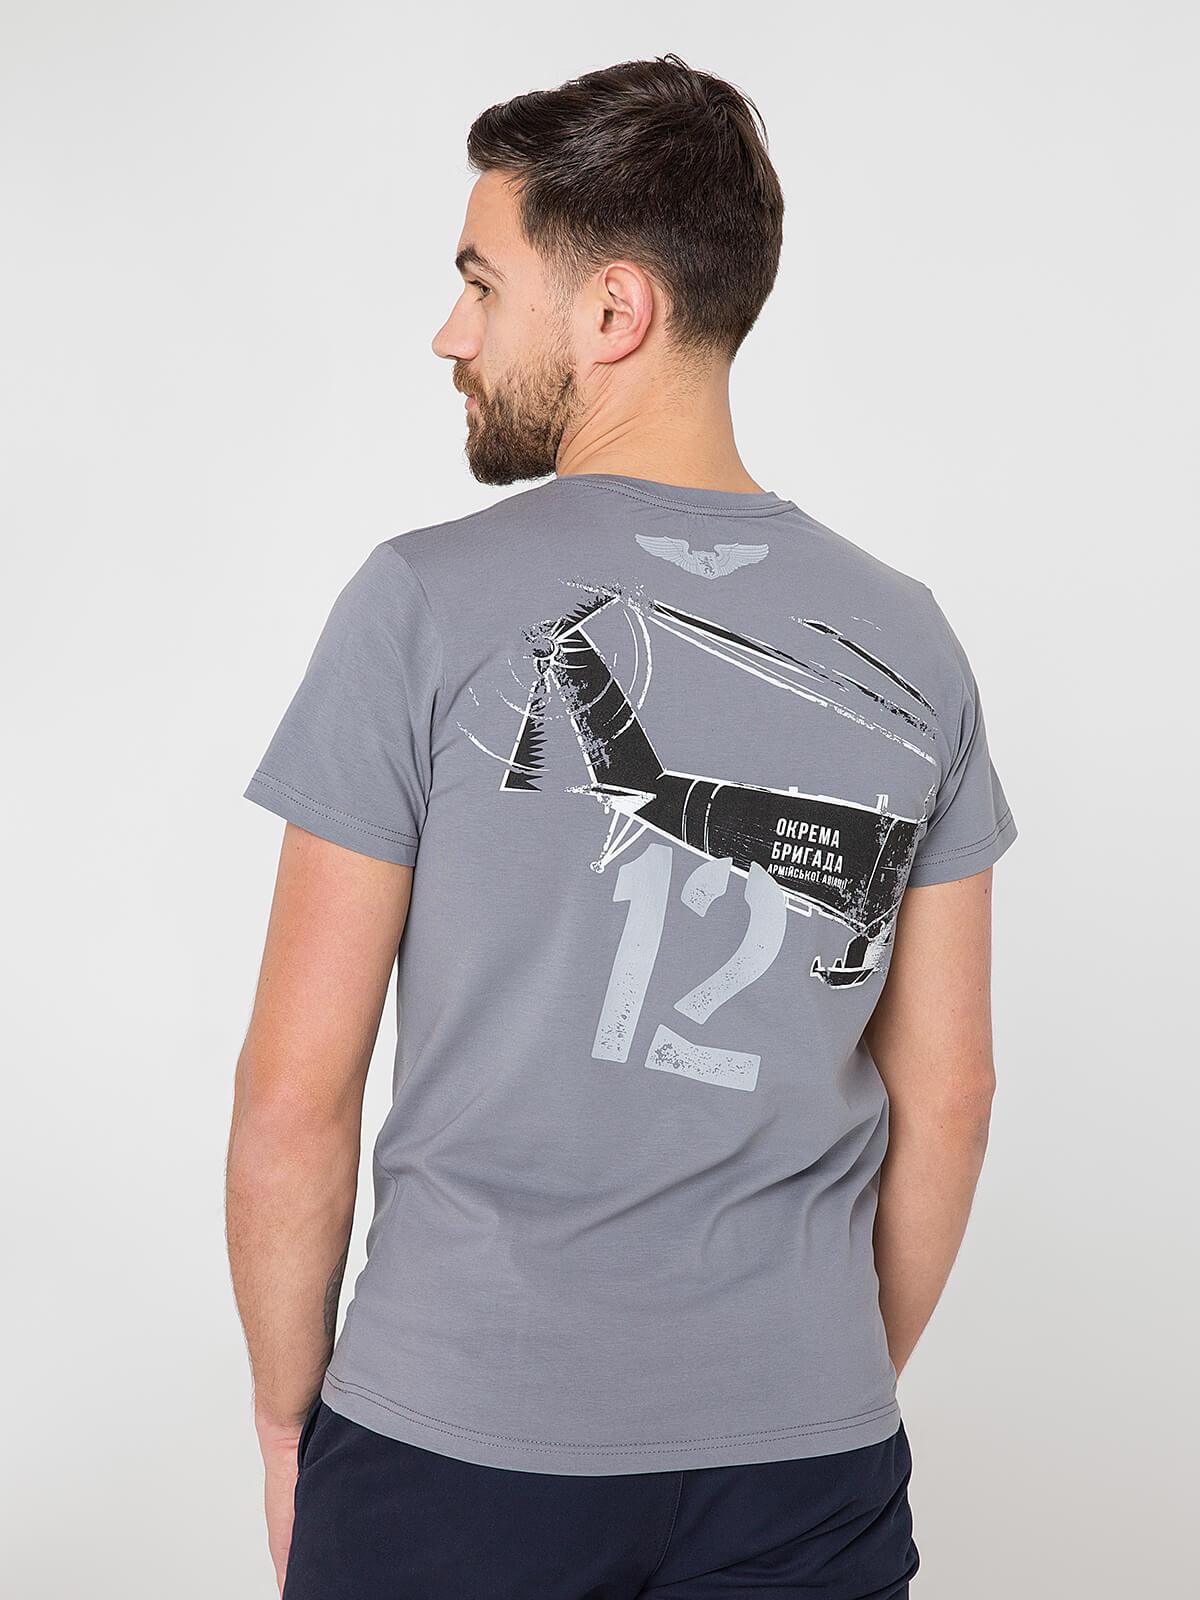 Men's T-Shirt Мі-24. Color gray.  Technique of prints applied: silkscreen printing.